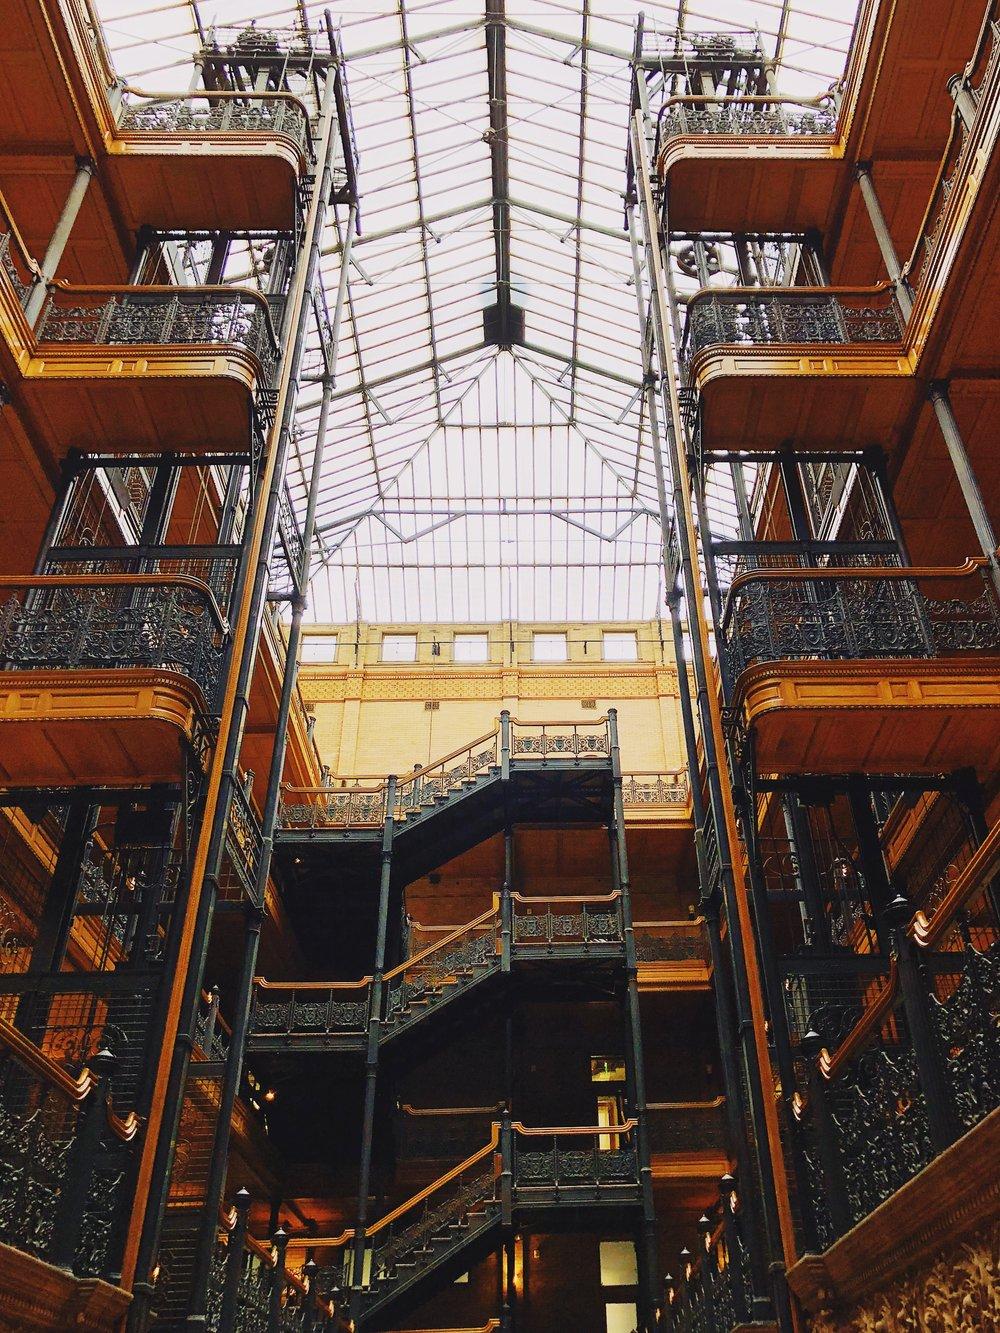 The L.A. Weekend Bucket List: Explore the Bradbury Building